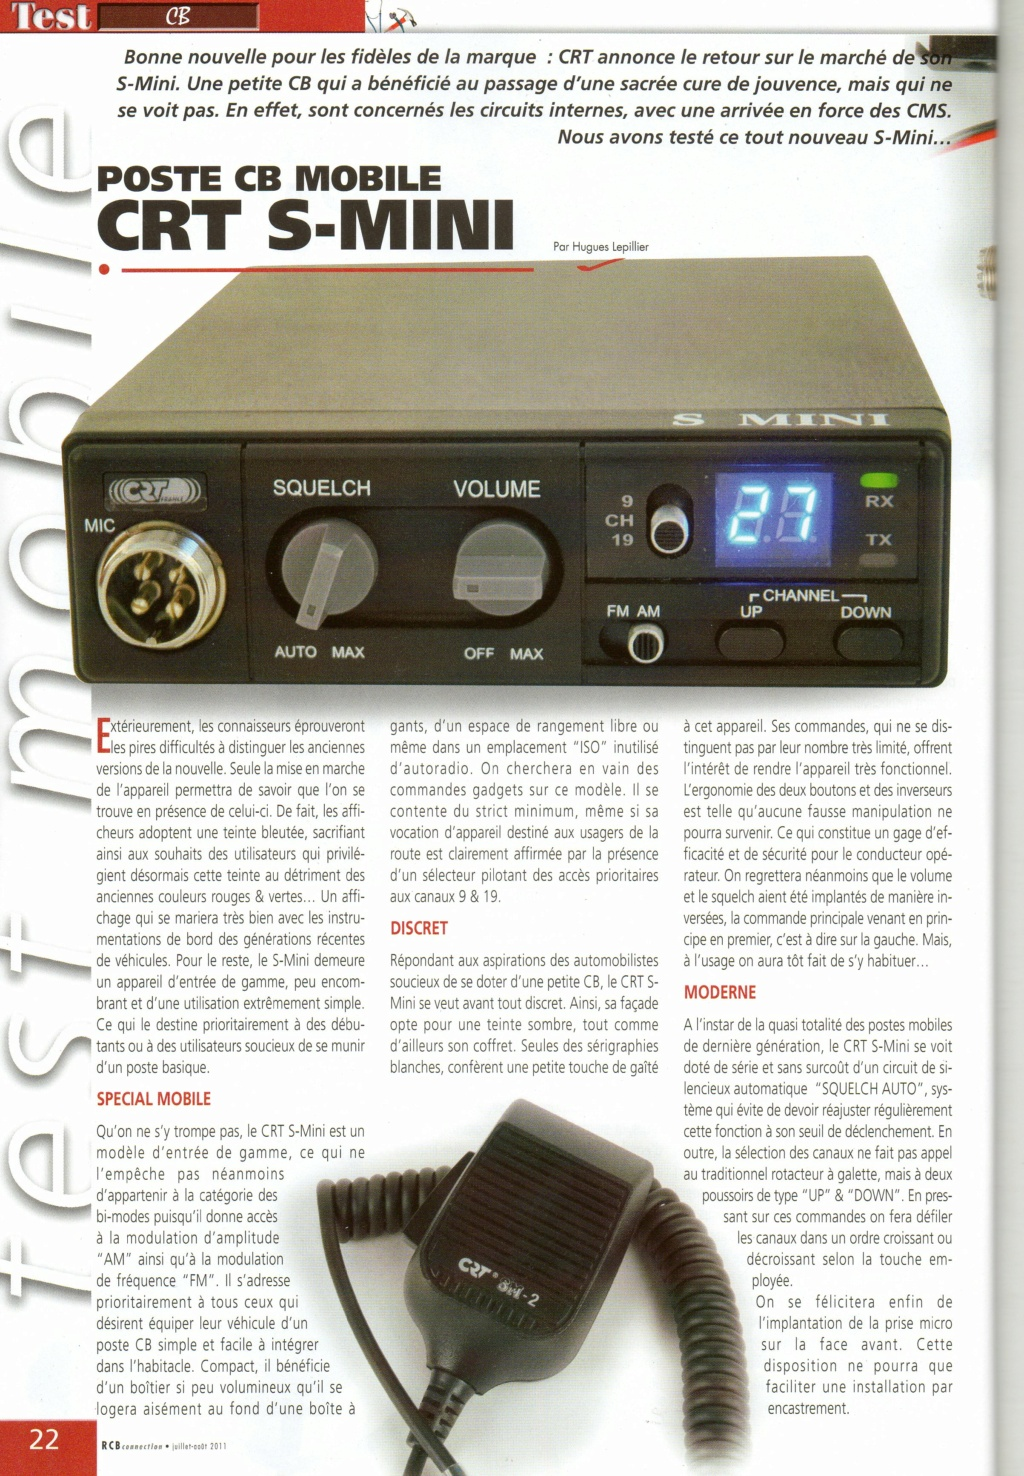 CRT S-Mini 2 (Mobile/4x4) Chora673